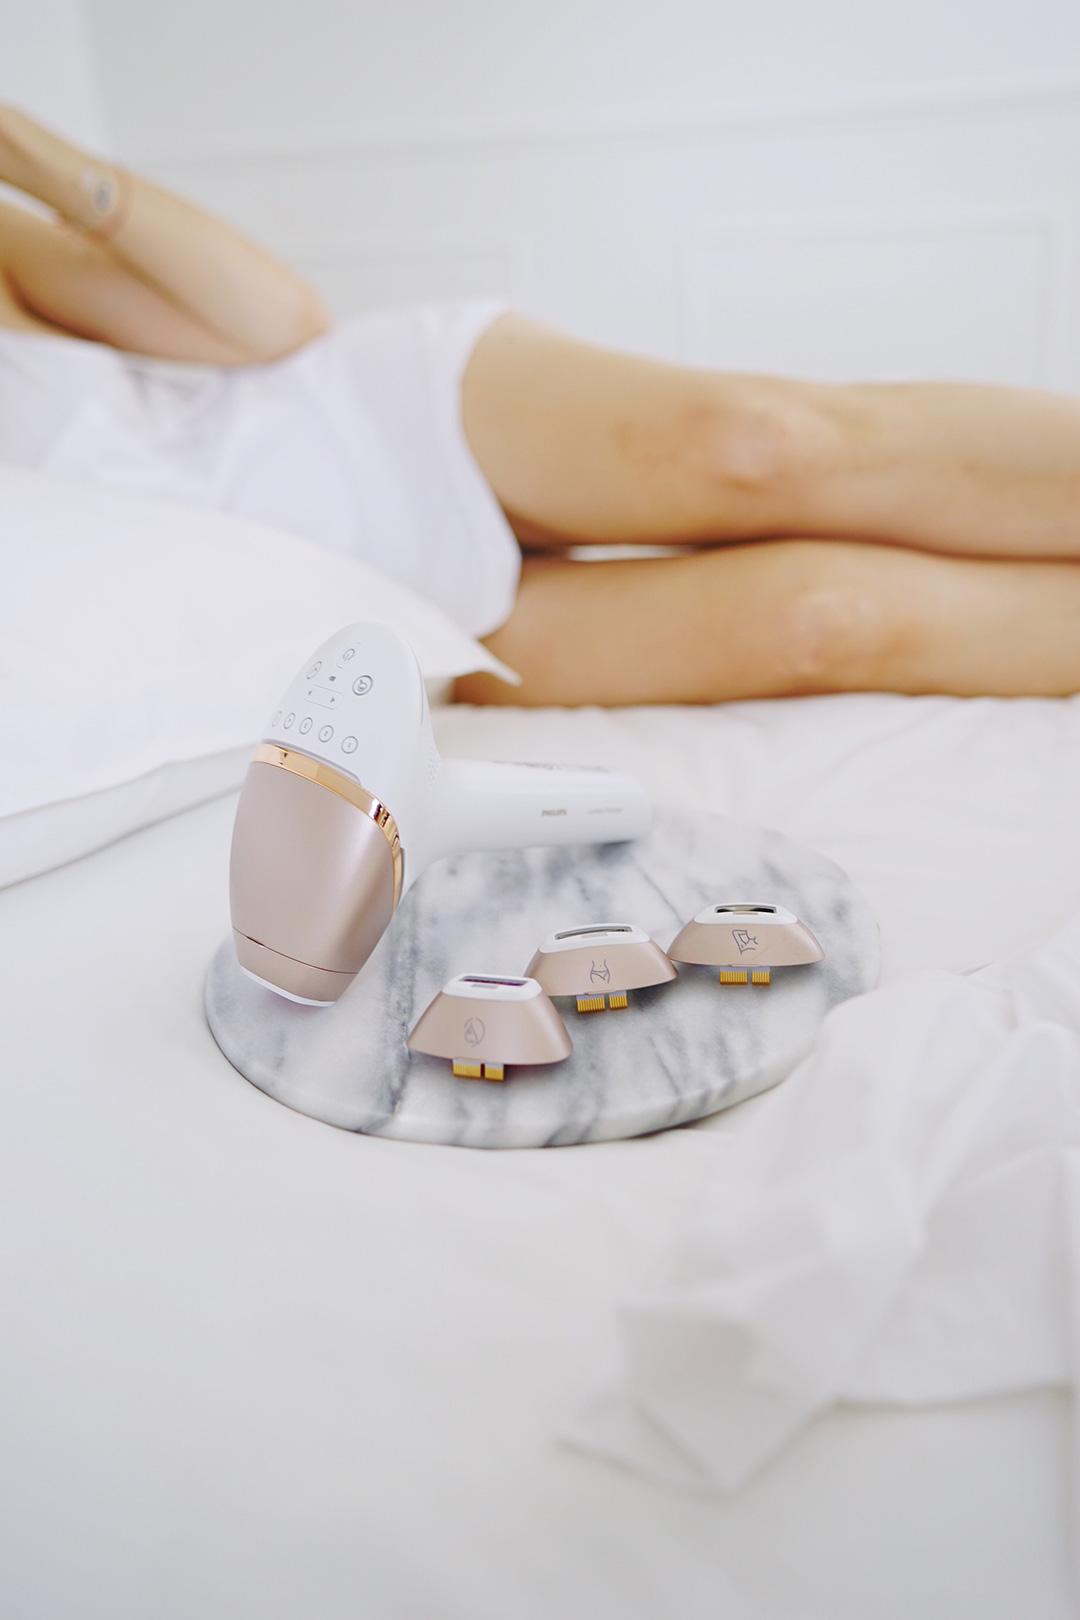 epilation la lumi re puls e merci lumea estelle segura blog mode influenceuse mode. Black Bedroom Furniture Sets. Home Design Ideas